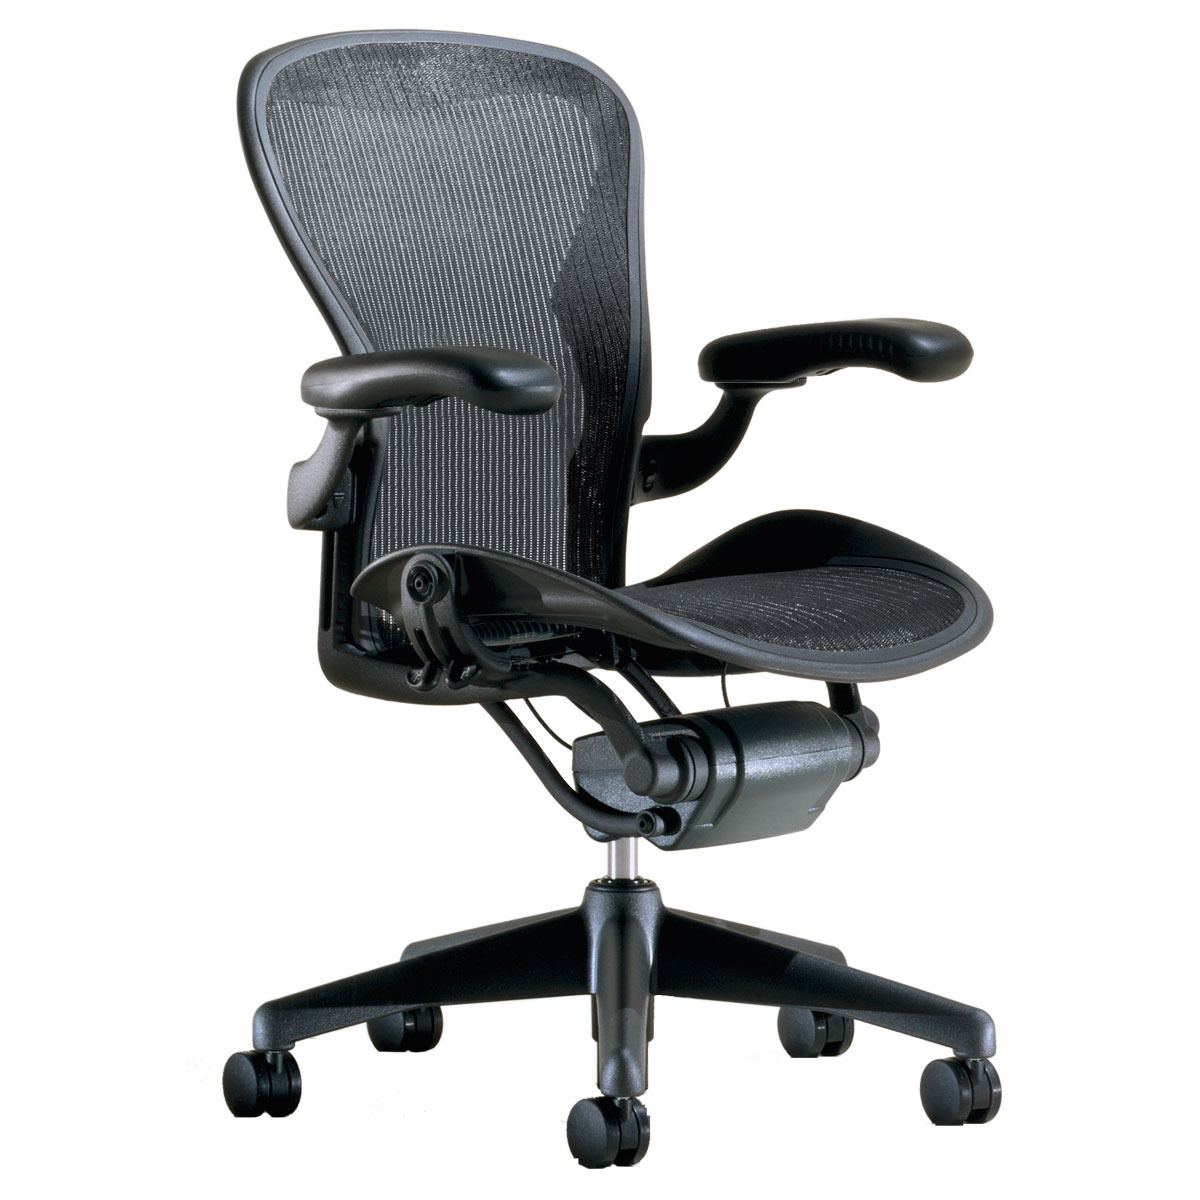 ergonomic chair ... ergonomic office chair bangalore ... GTWIGAR